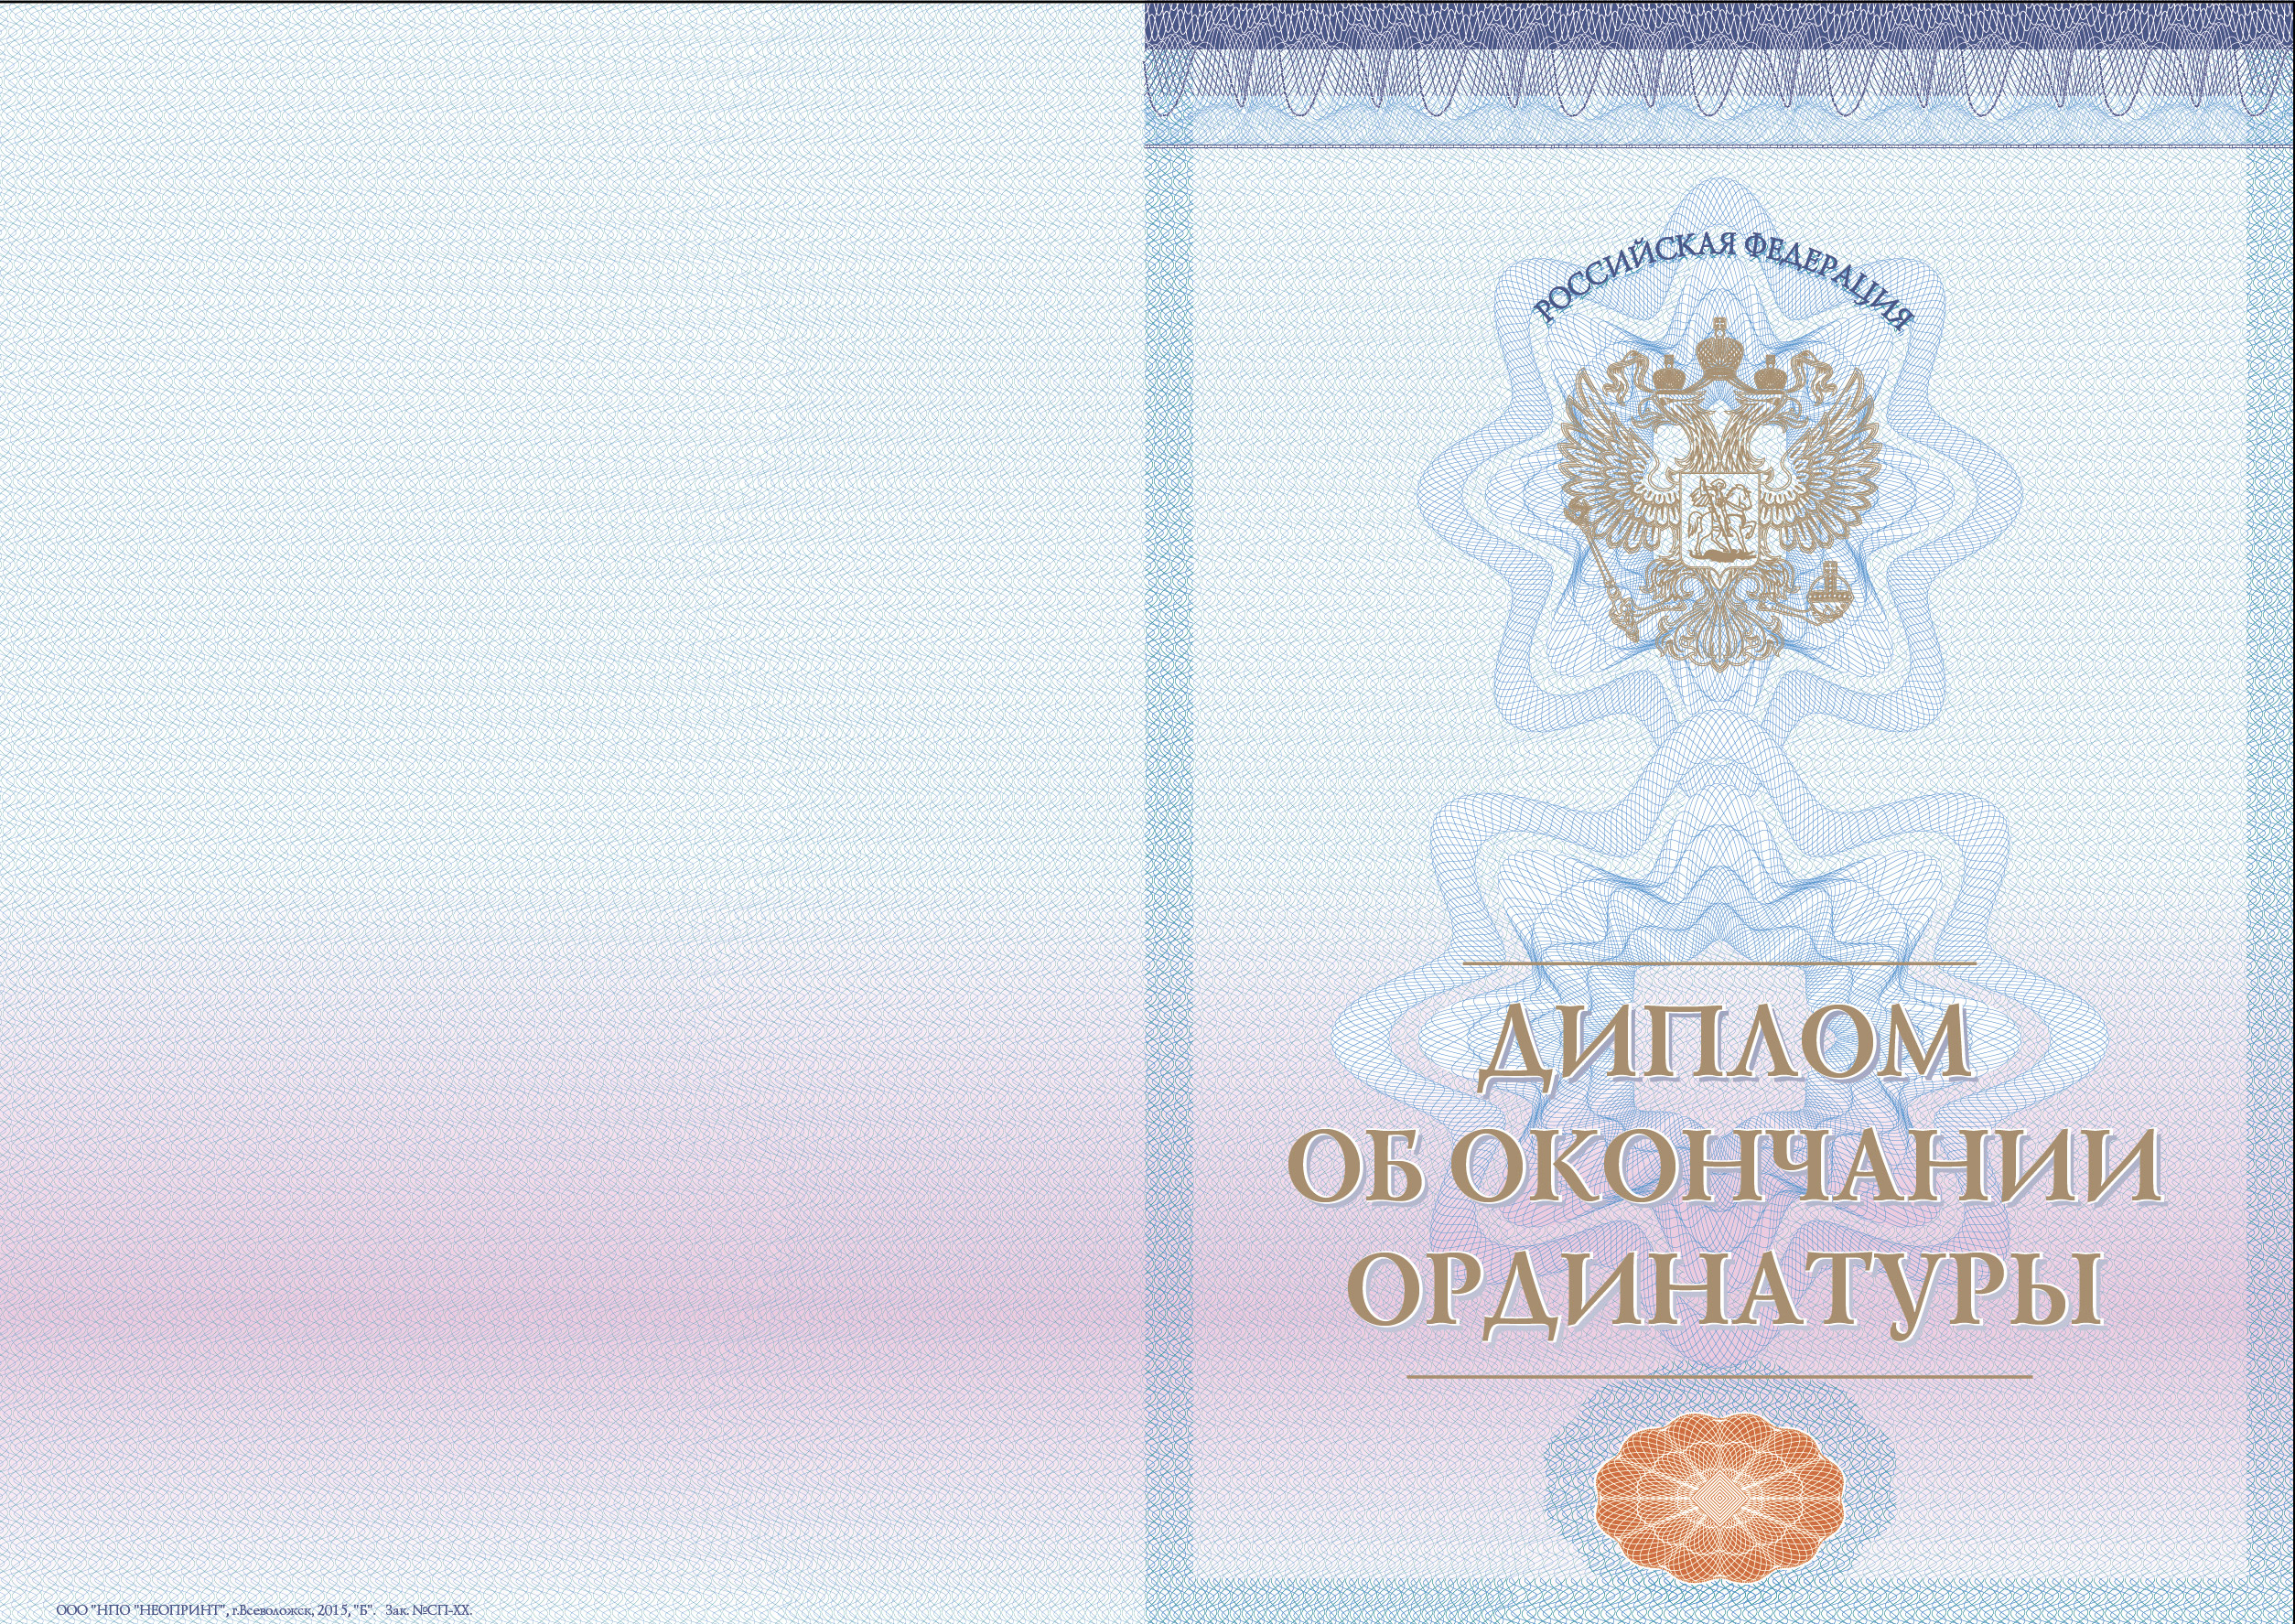 Бланки дипломов аспиранта ординатора интерна Купить бланк диплома ординатора